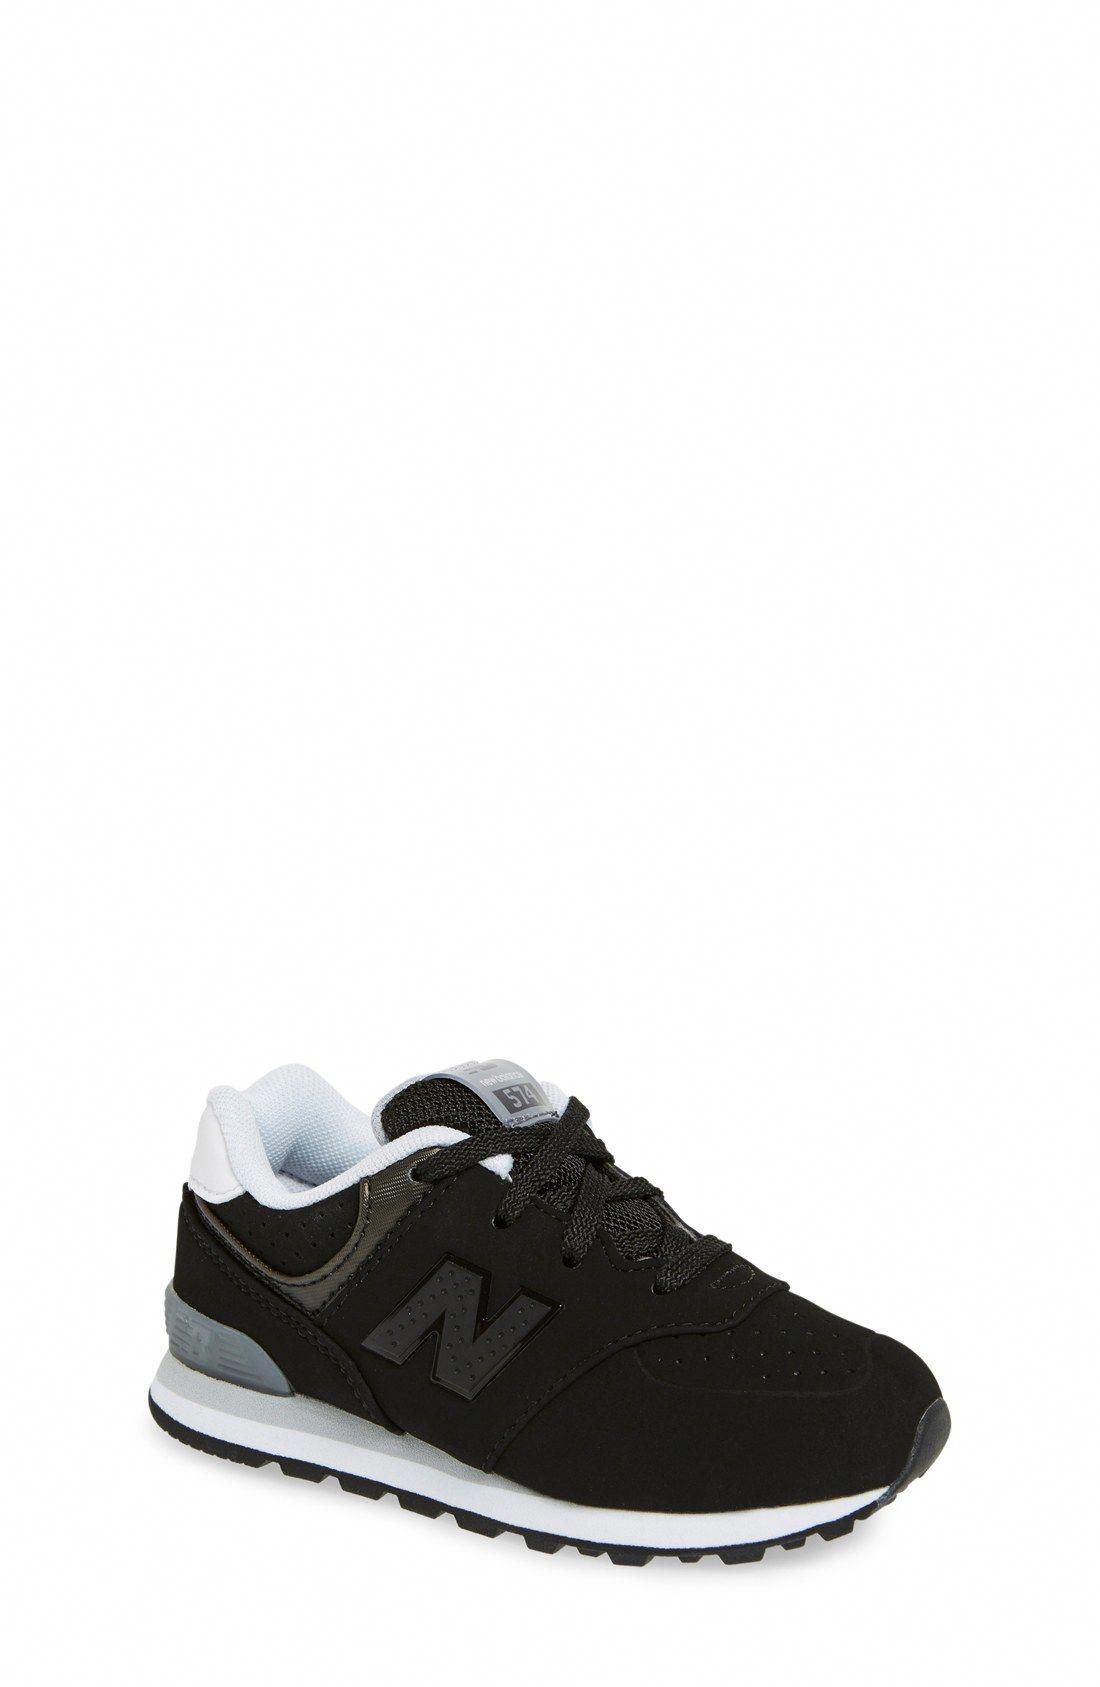 SneakerwalkerToddlerLittle New Balance Kidamp; Acrylic' Big '574 thCQrosdxB